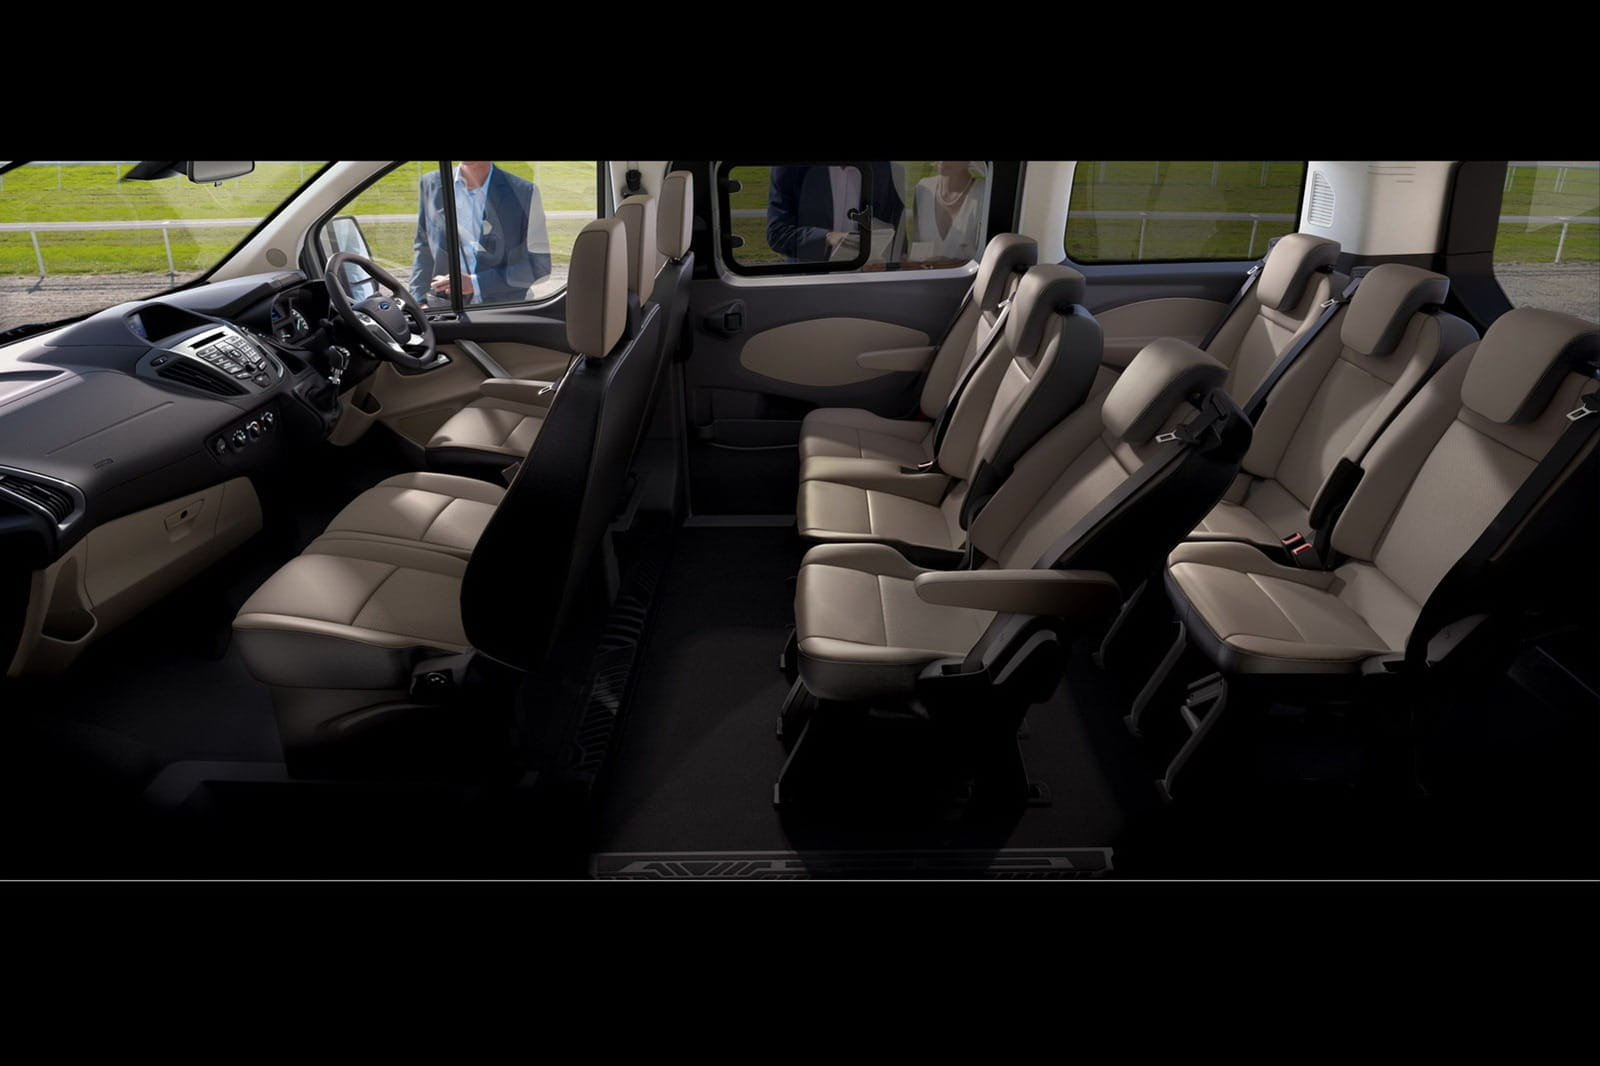 ford tourneo custom 2012 un peque o y moderno mini bus foto 1 de 5. Black Bedroom Furniture Sets. Home Design Ideas